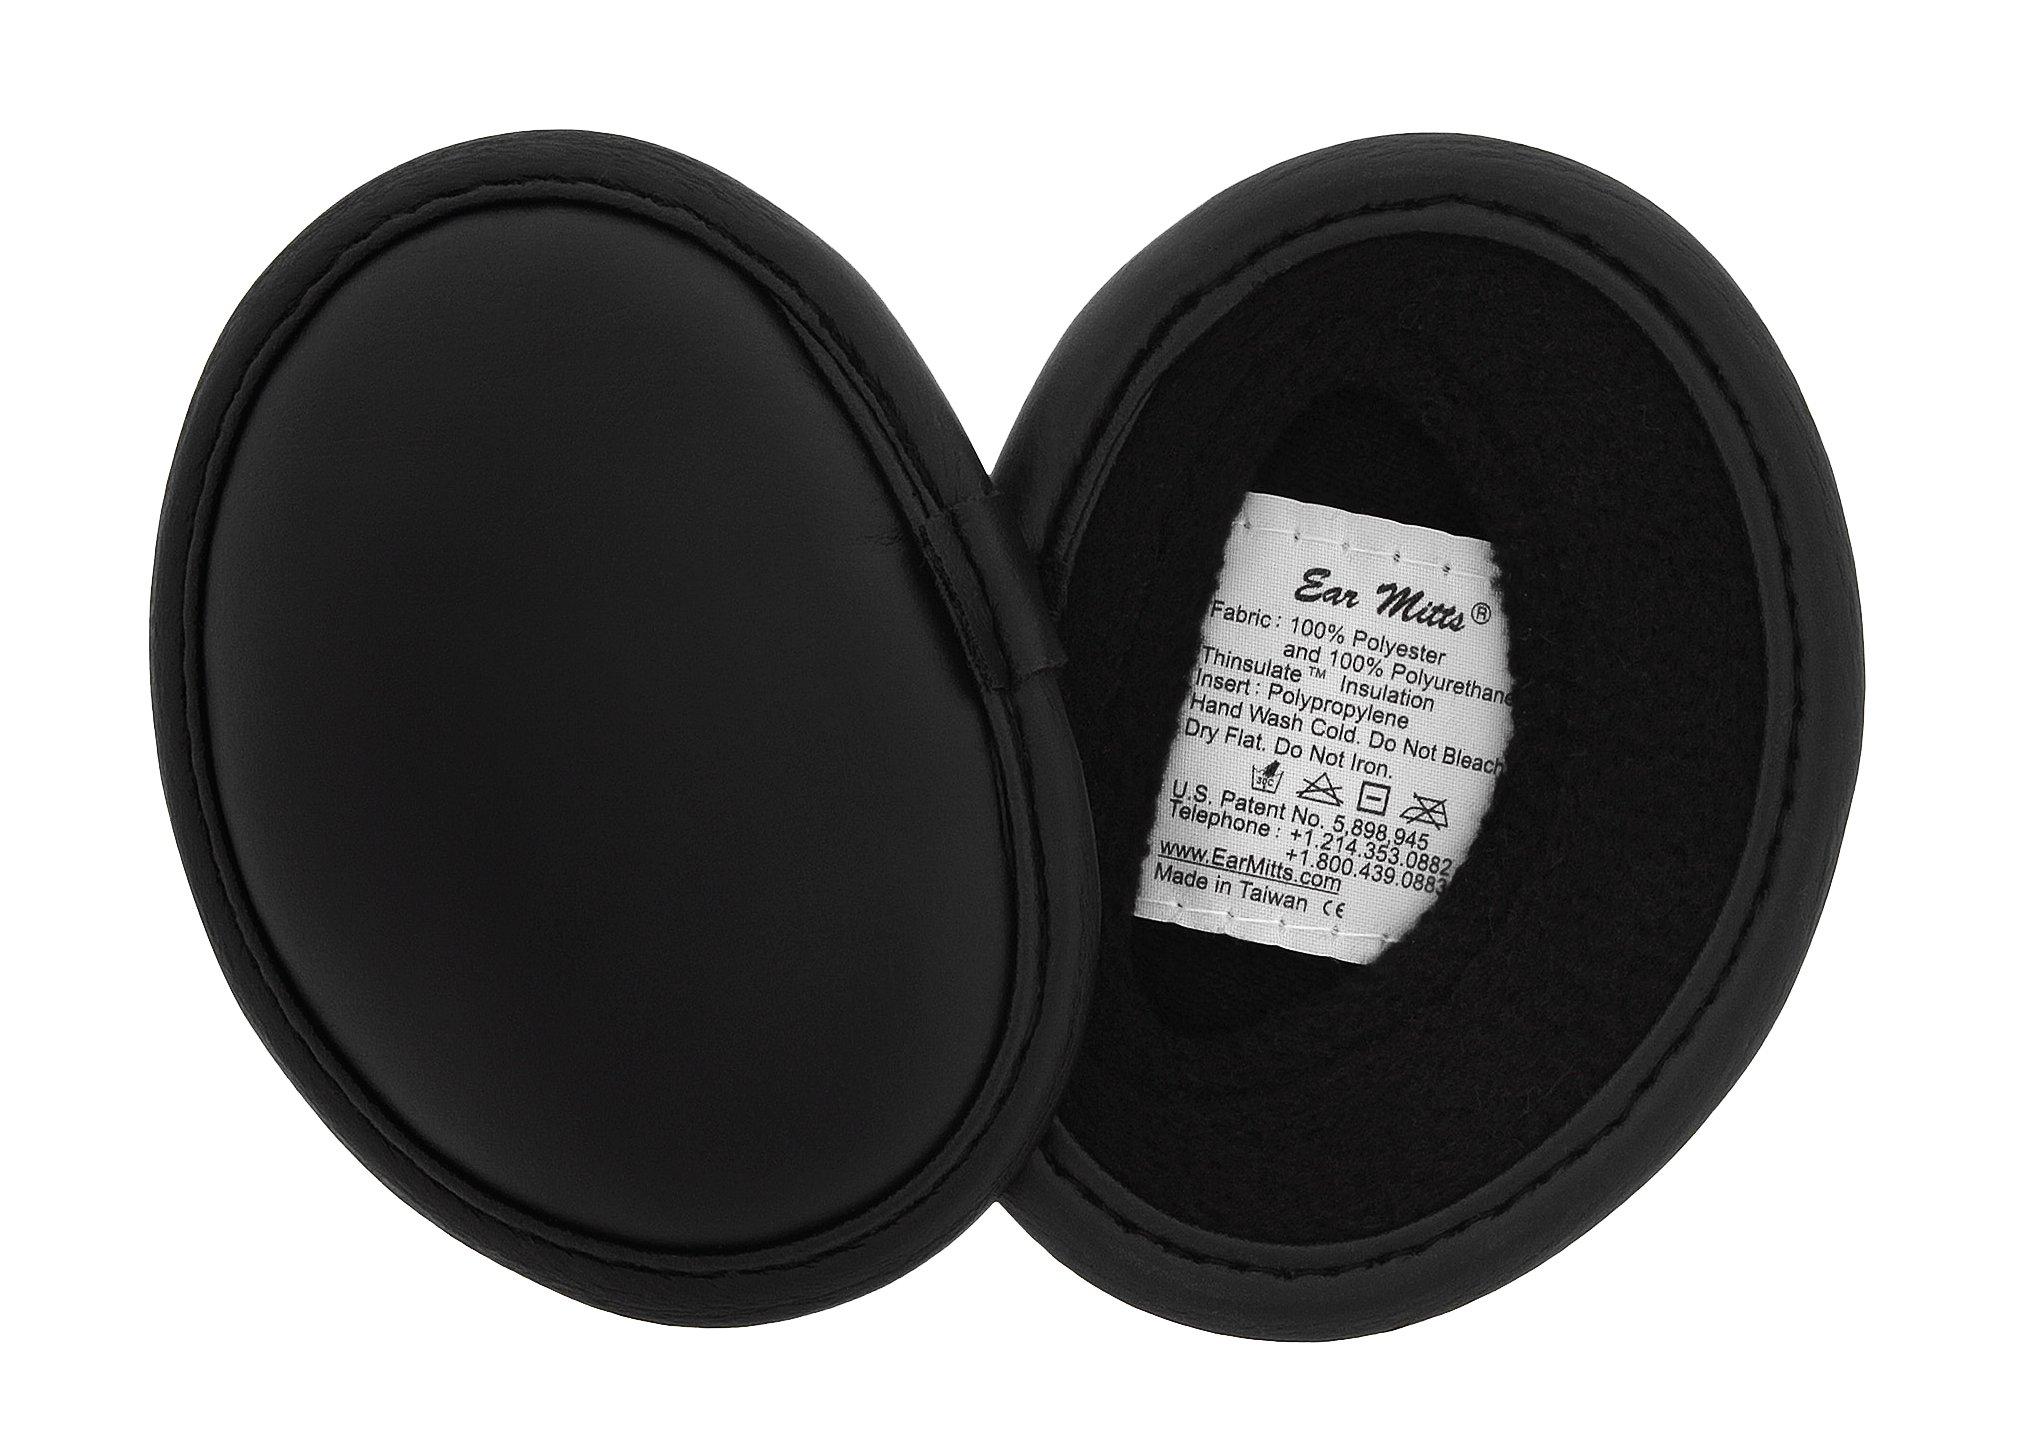 Ear Mitts Bandless Ear Muffs, Black Faux Leather Ear Warmers, Regular